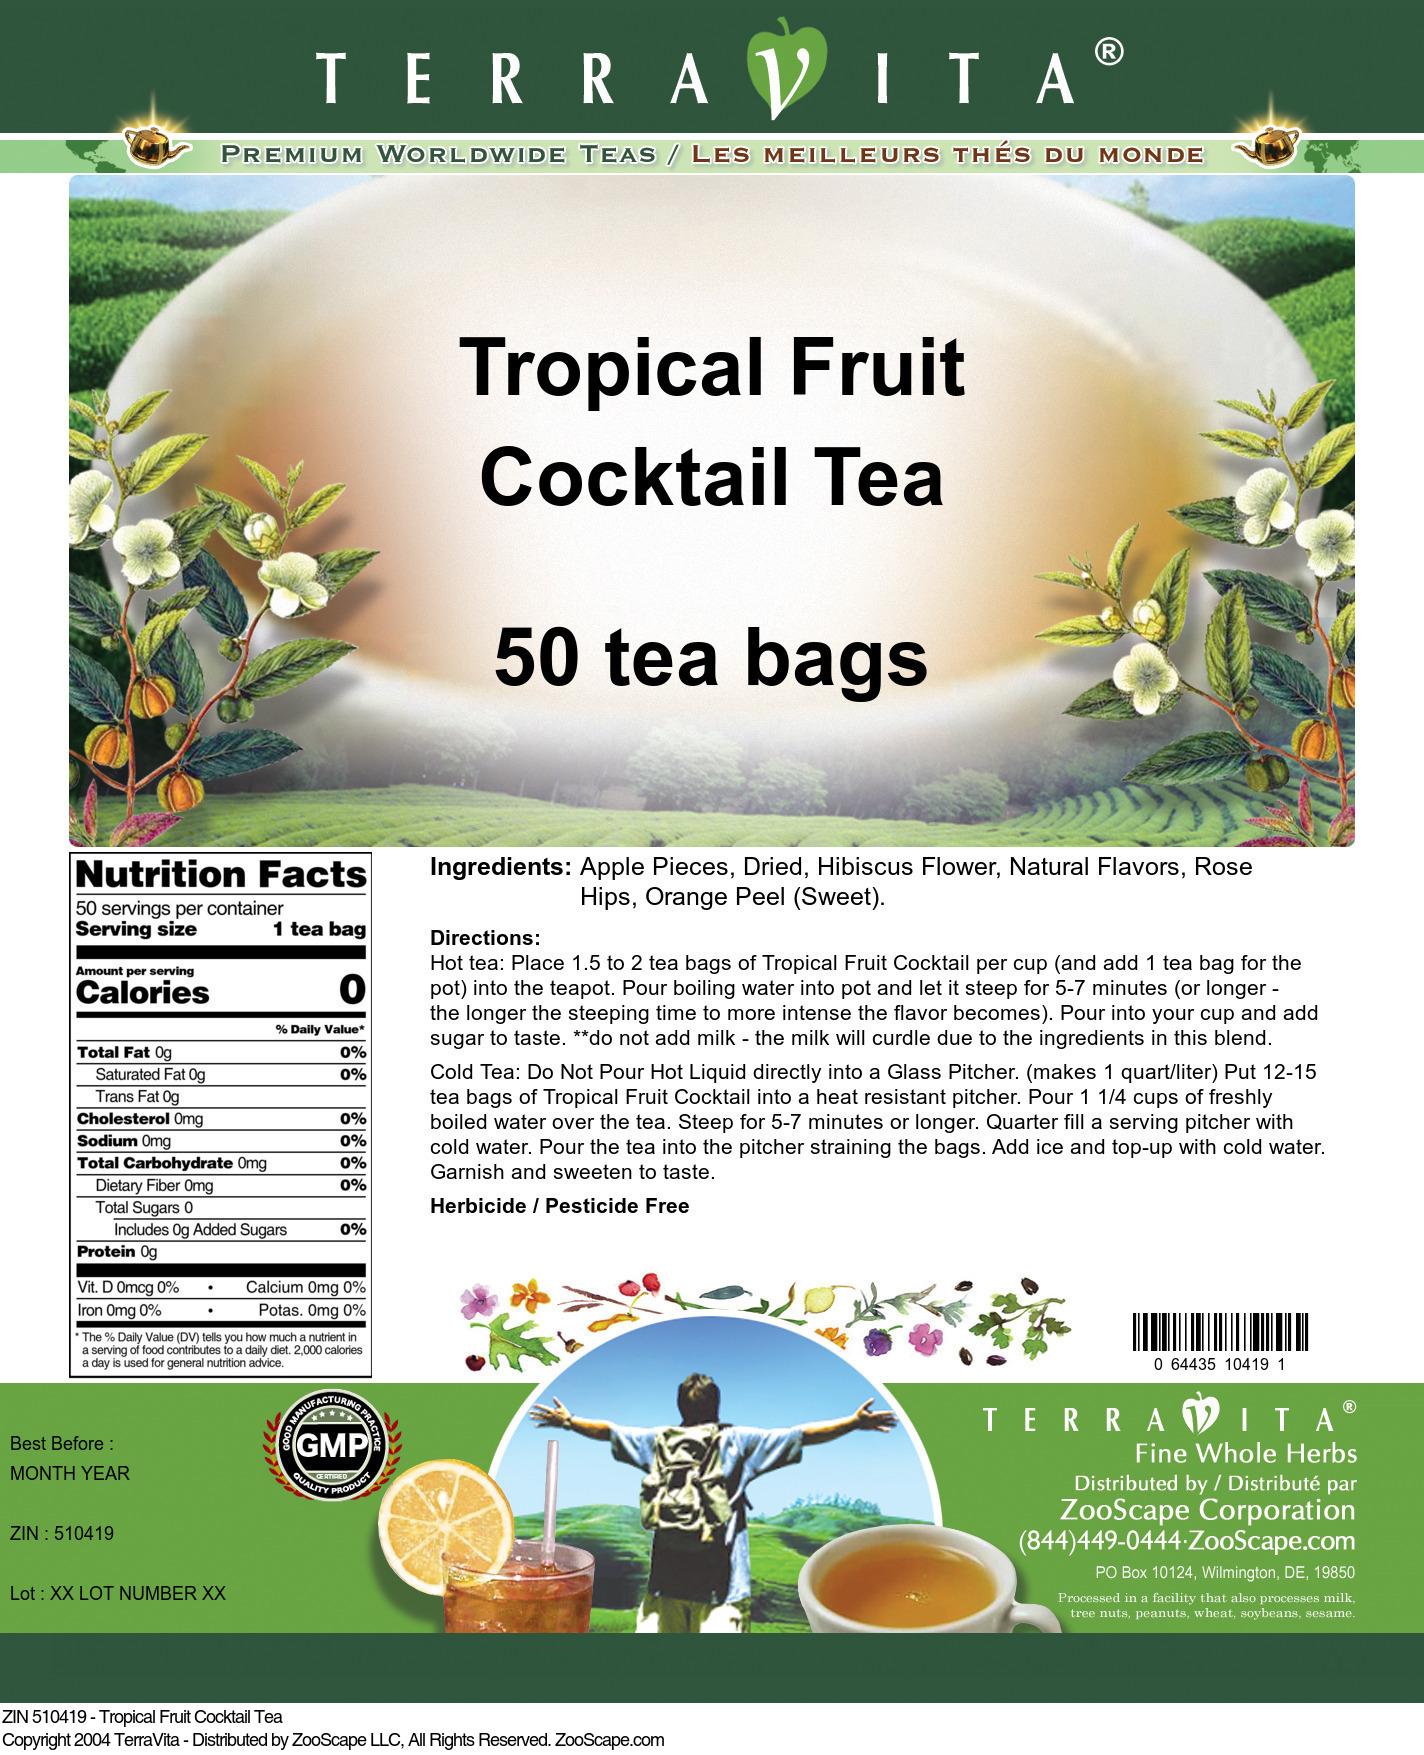 Tropical Fruit Cocktail Tea